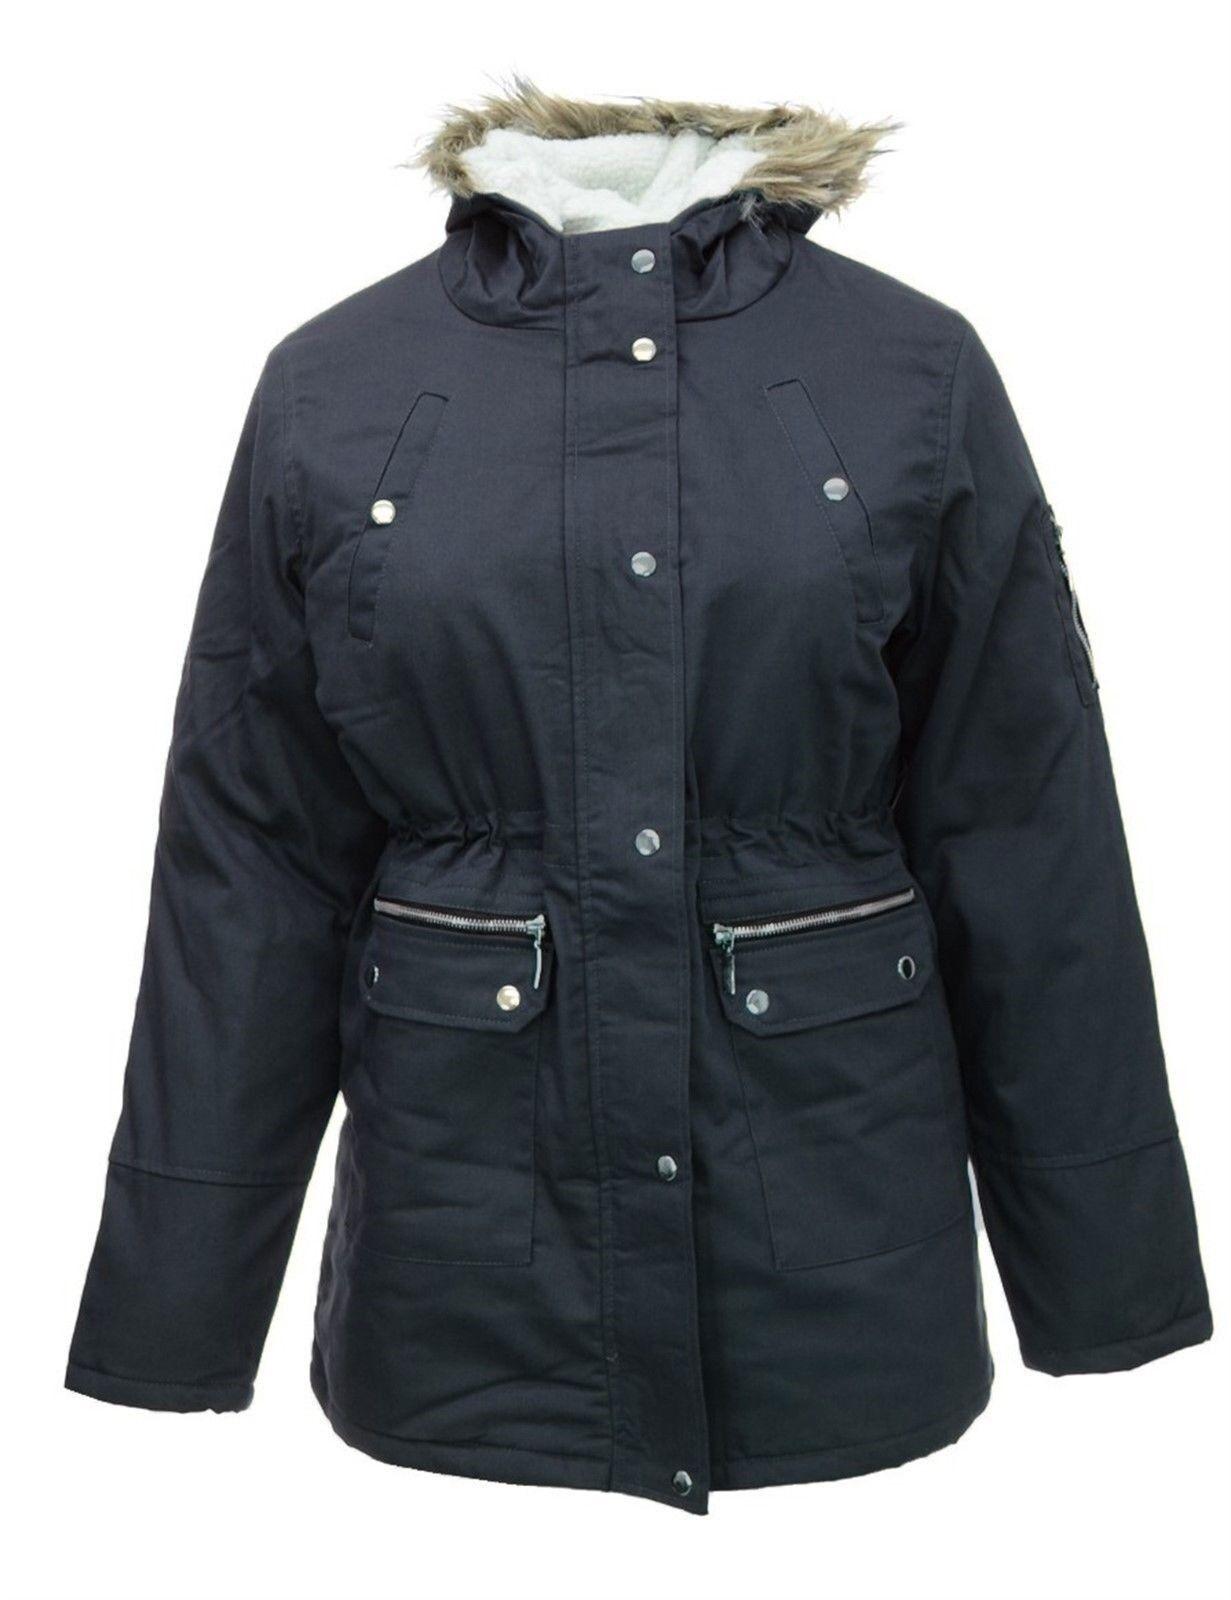 Para mujer 16-30 Nueva chaqueta azul marino de Parka Abrigo largo Forro de piel forrada con forro polar Mujeres